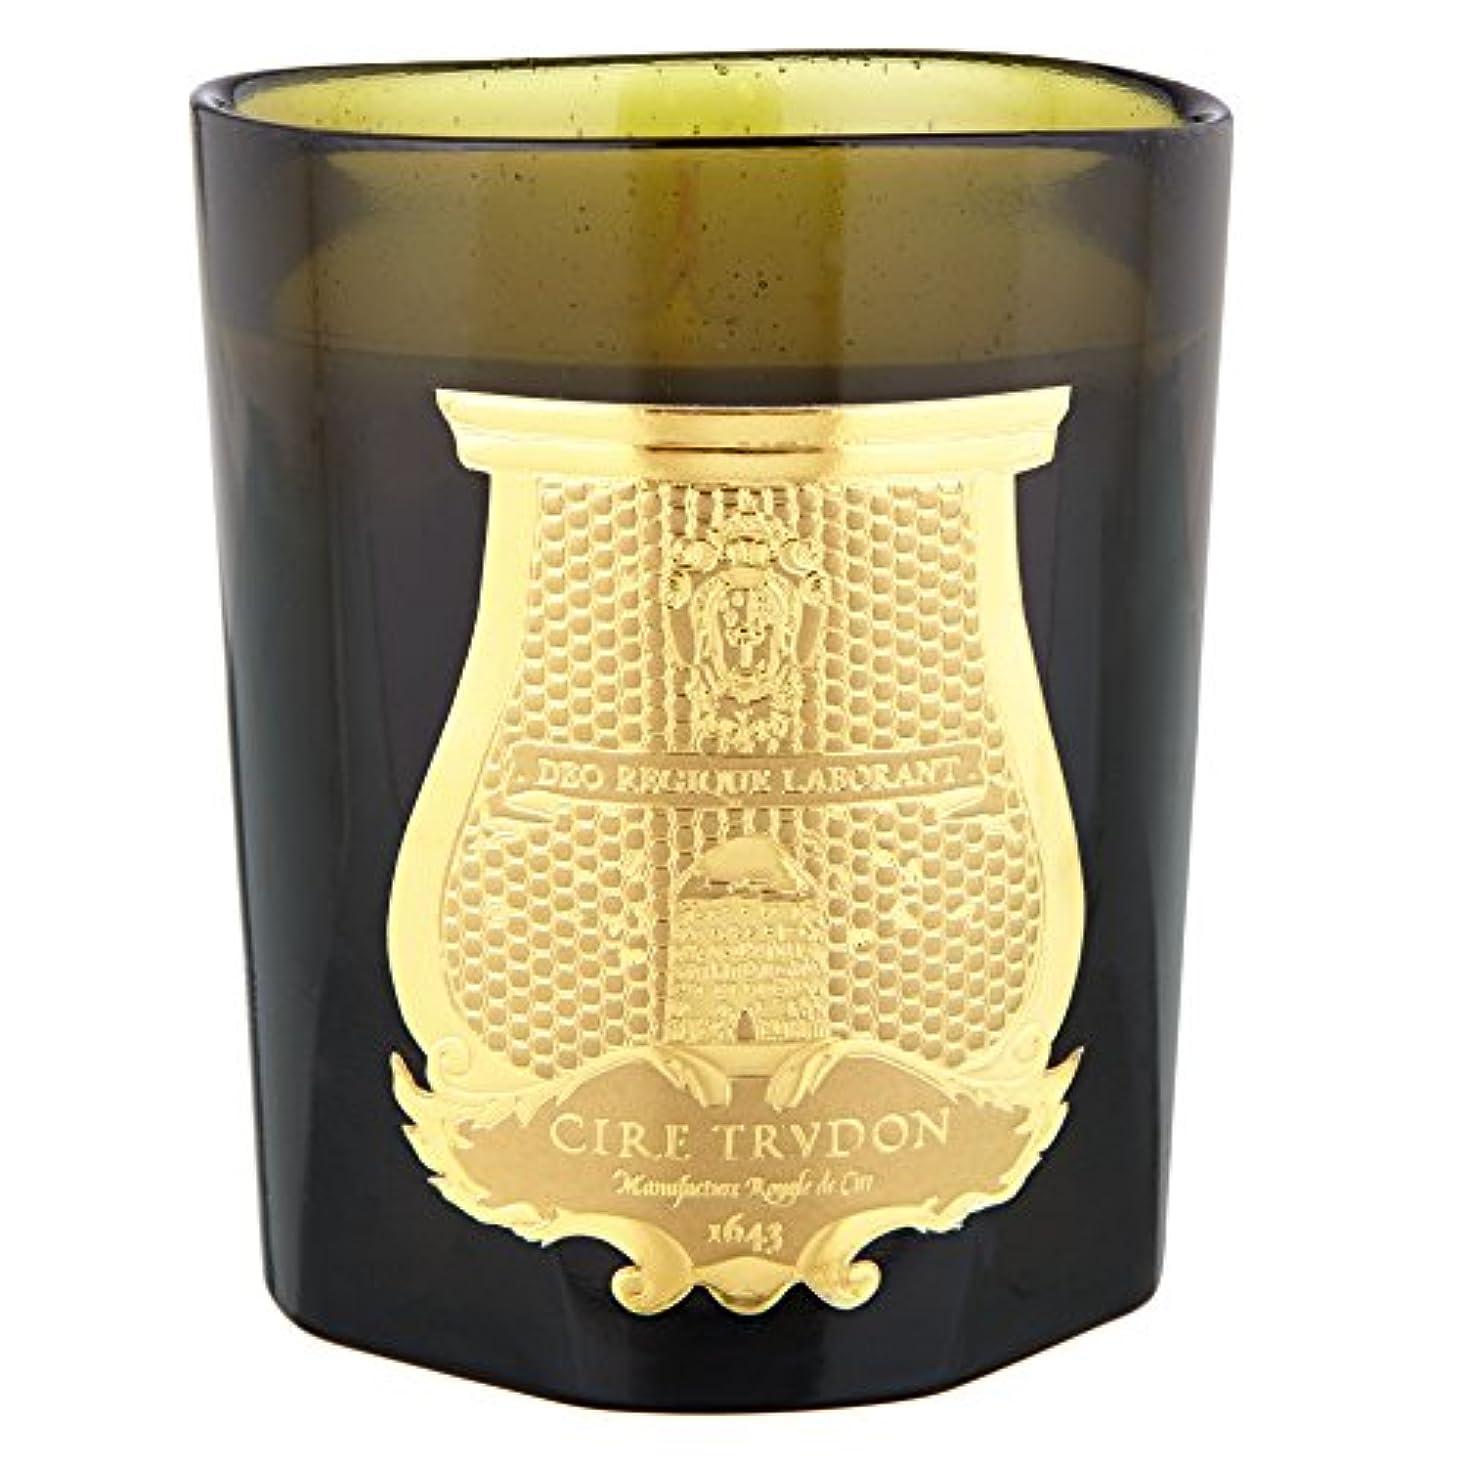 Cire Trudonオダリスク香りのキャンドル (Cire Trudon) - Cire Trudon Odalisque Scented Candle [並行輸入品]